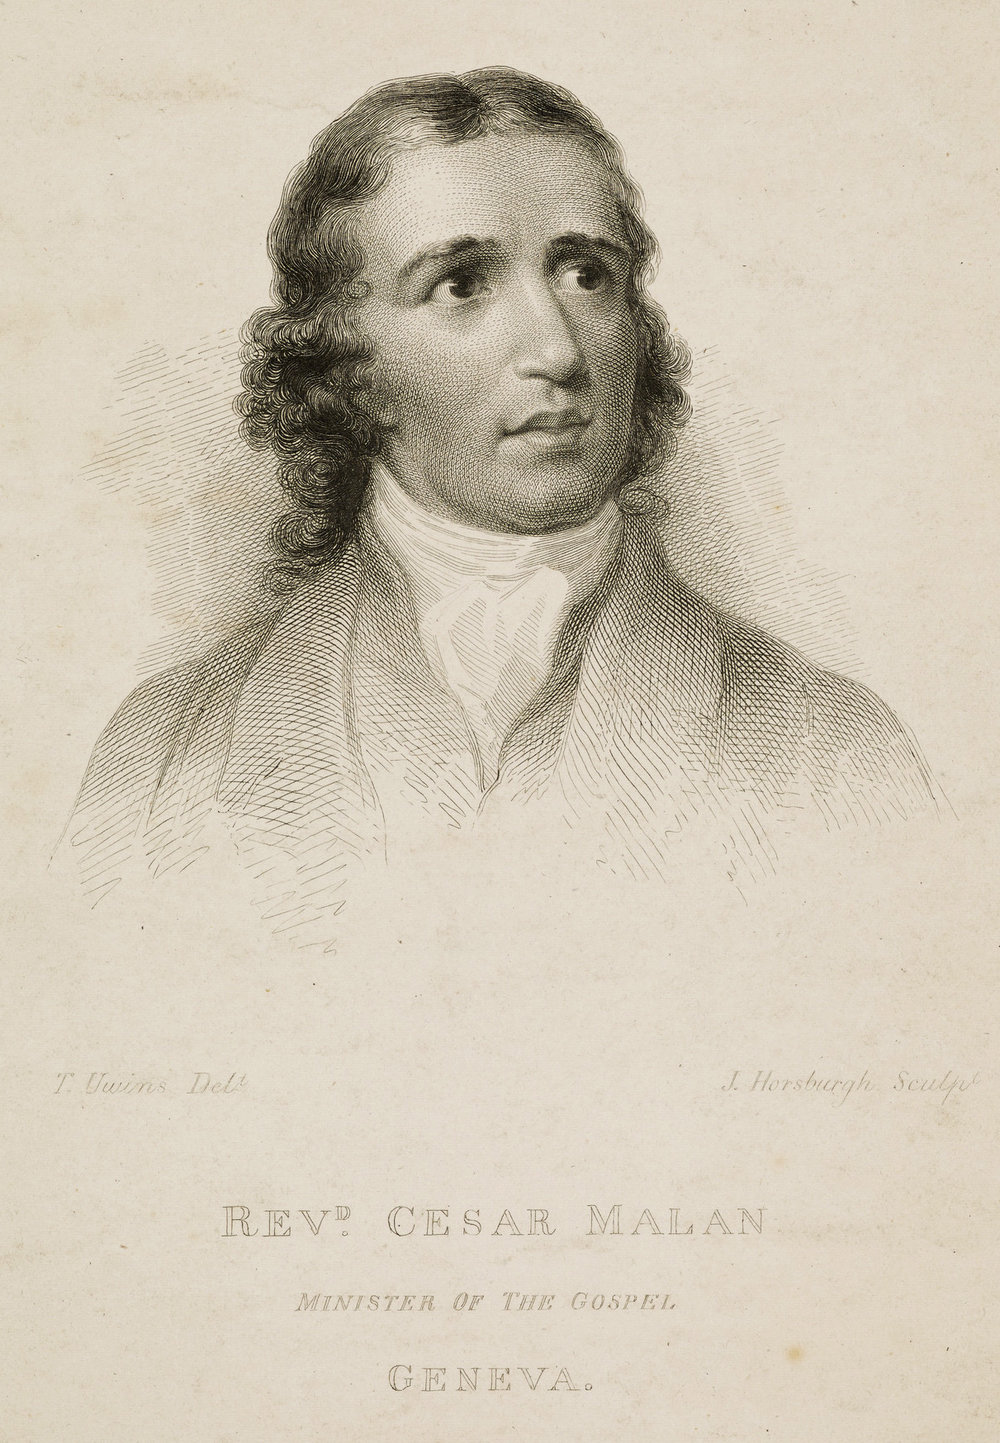 H.A. César Malan,  engraving by J. Horsburgh, after a portrait by Thomas Unwins,  National Galleries Scotland